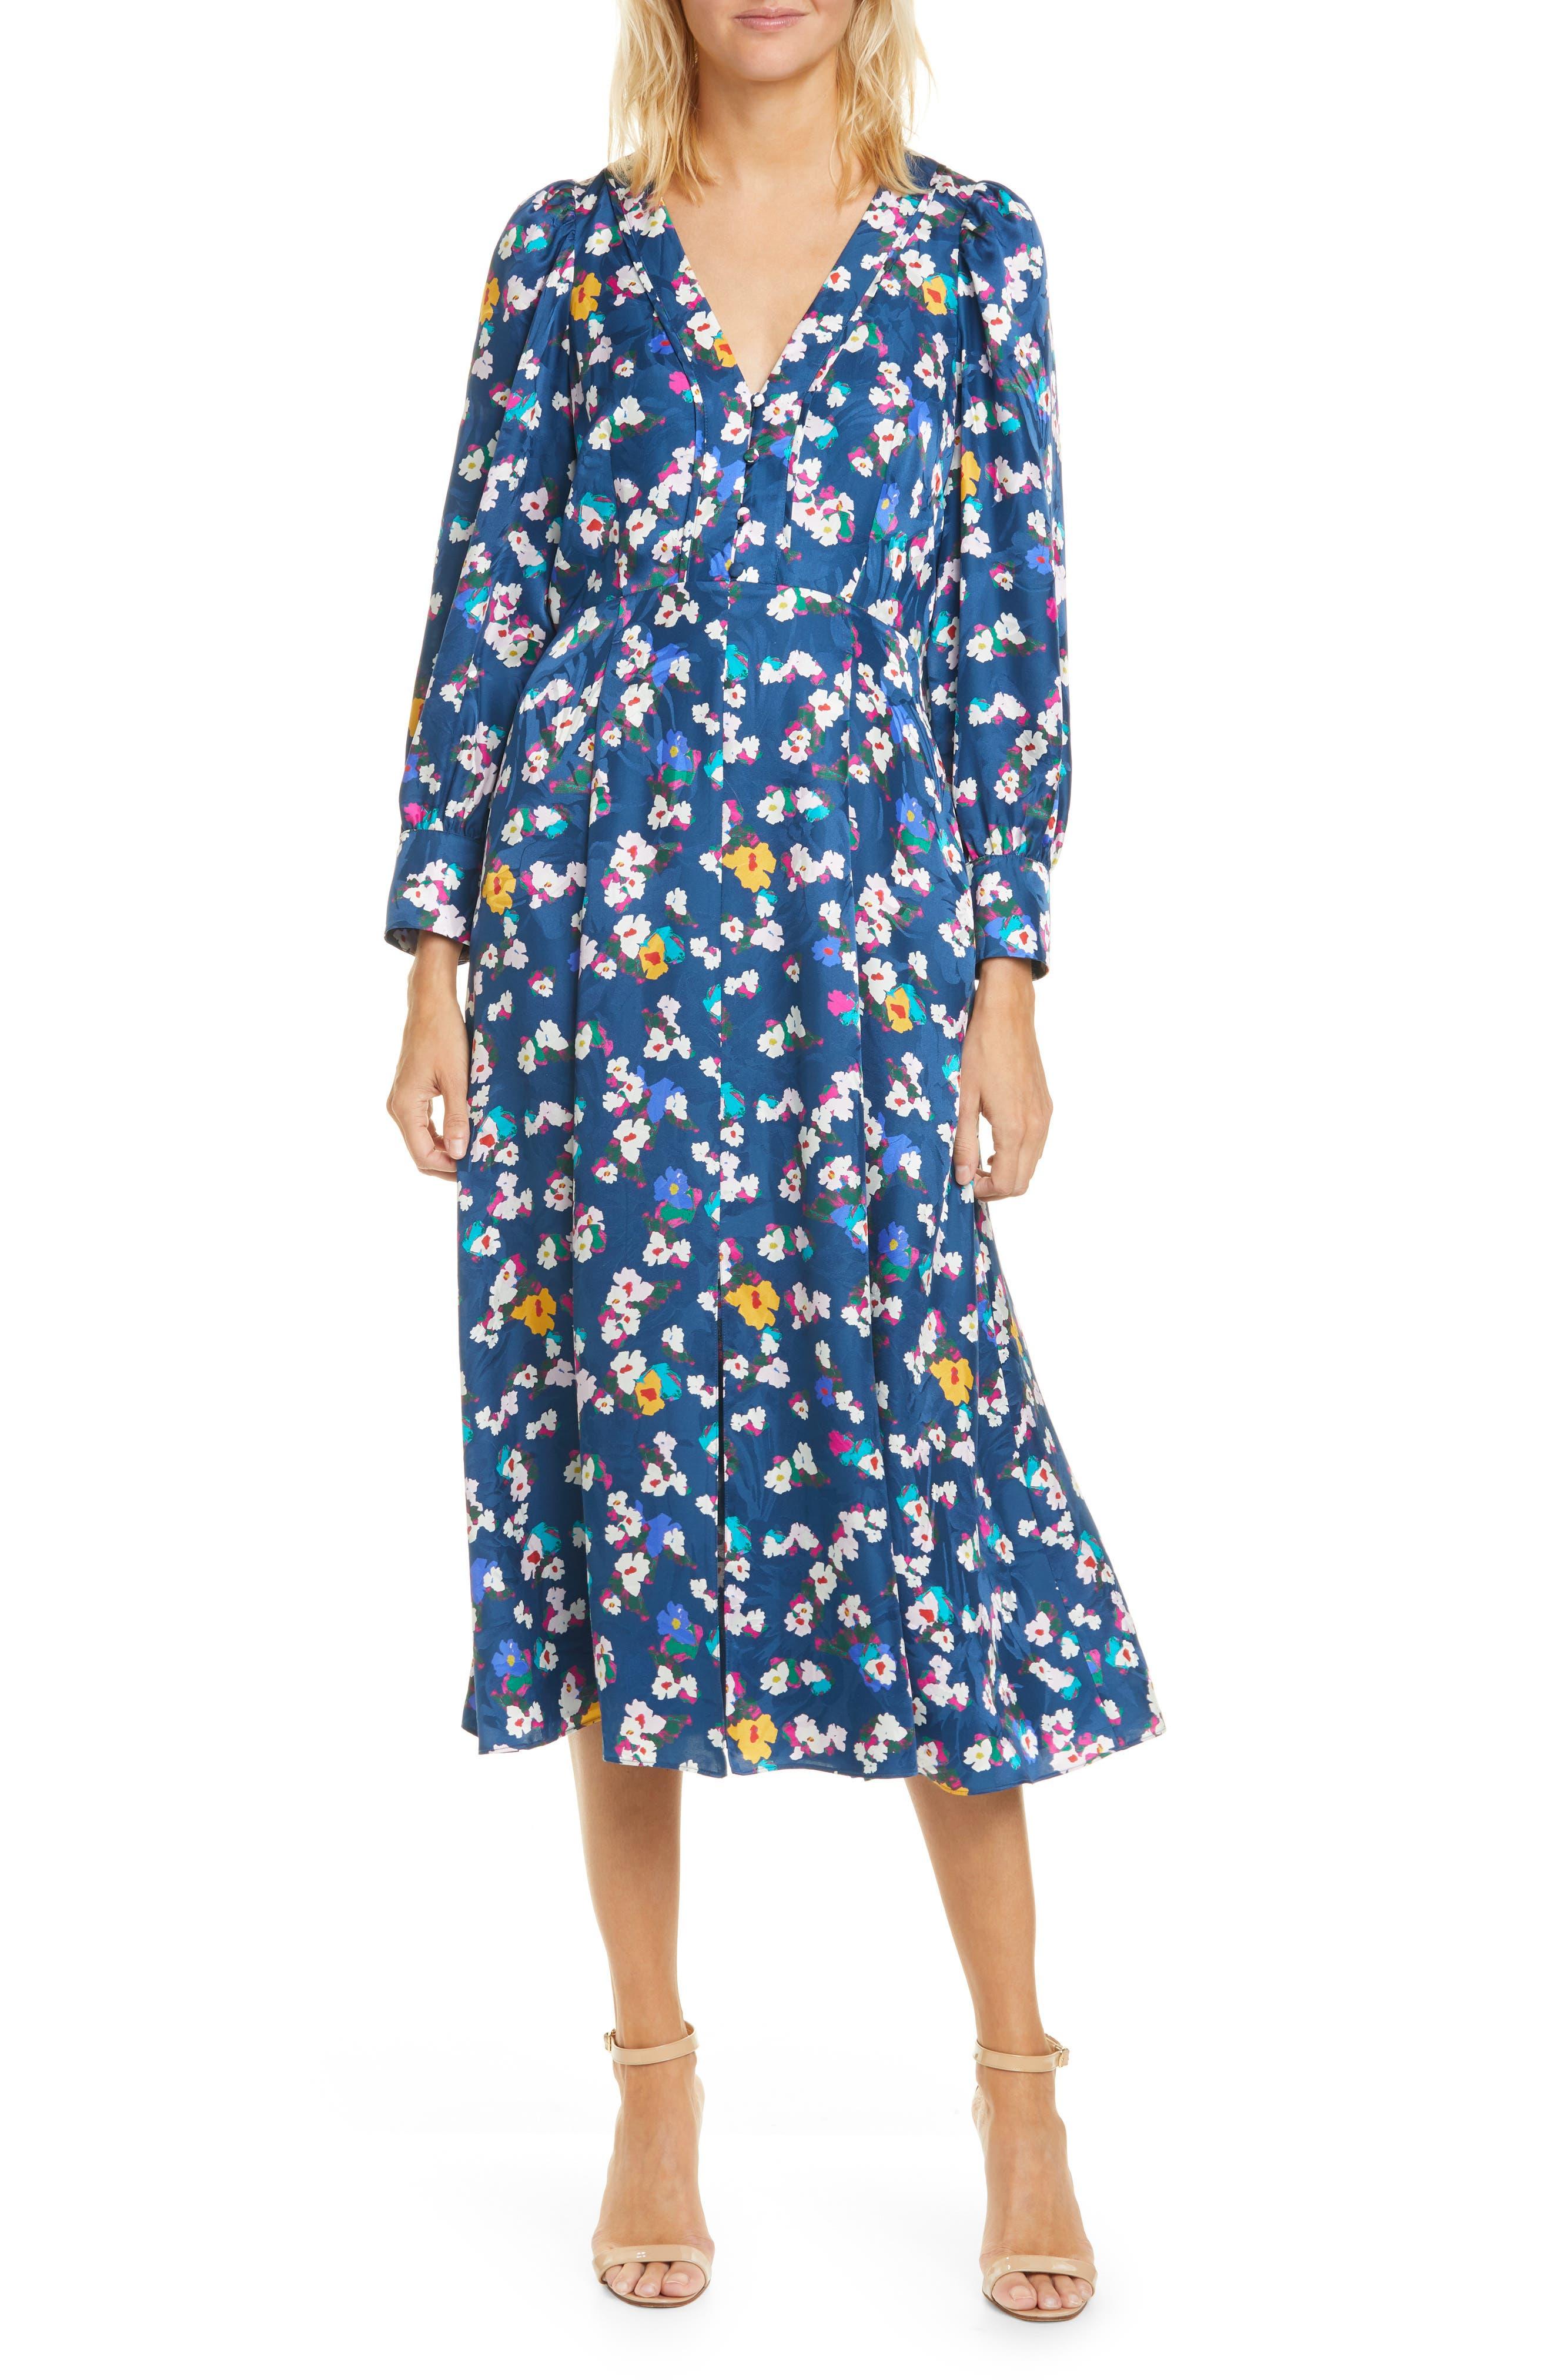 1930s Art Deco Plus Size Dresses | Tea Dresses, Party Dresses Womens Tanya Taylor Thelma Floral Silk Jacquard Long Sleeve Silk Midi Dress $695.00 AT vintagedancer.com